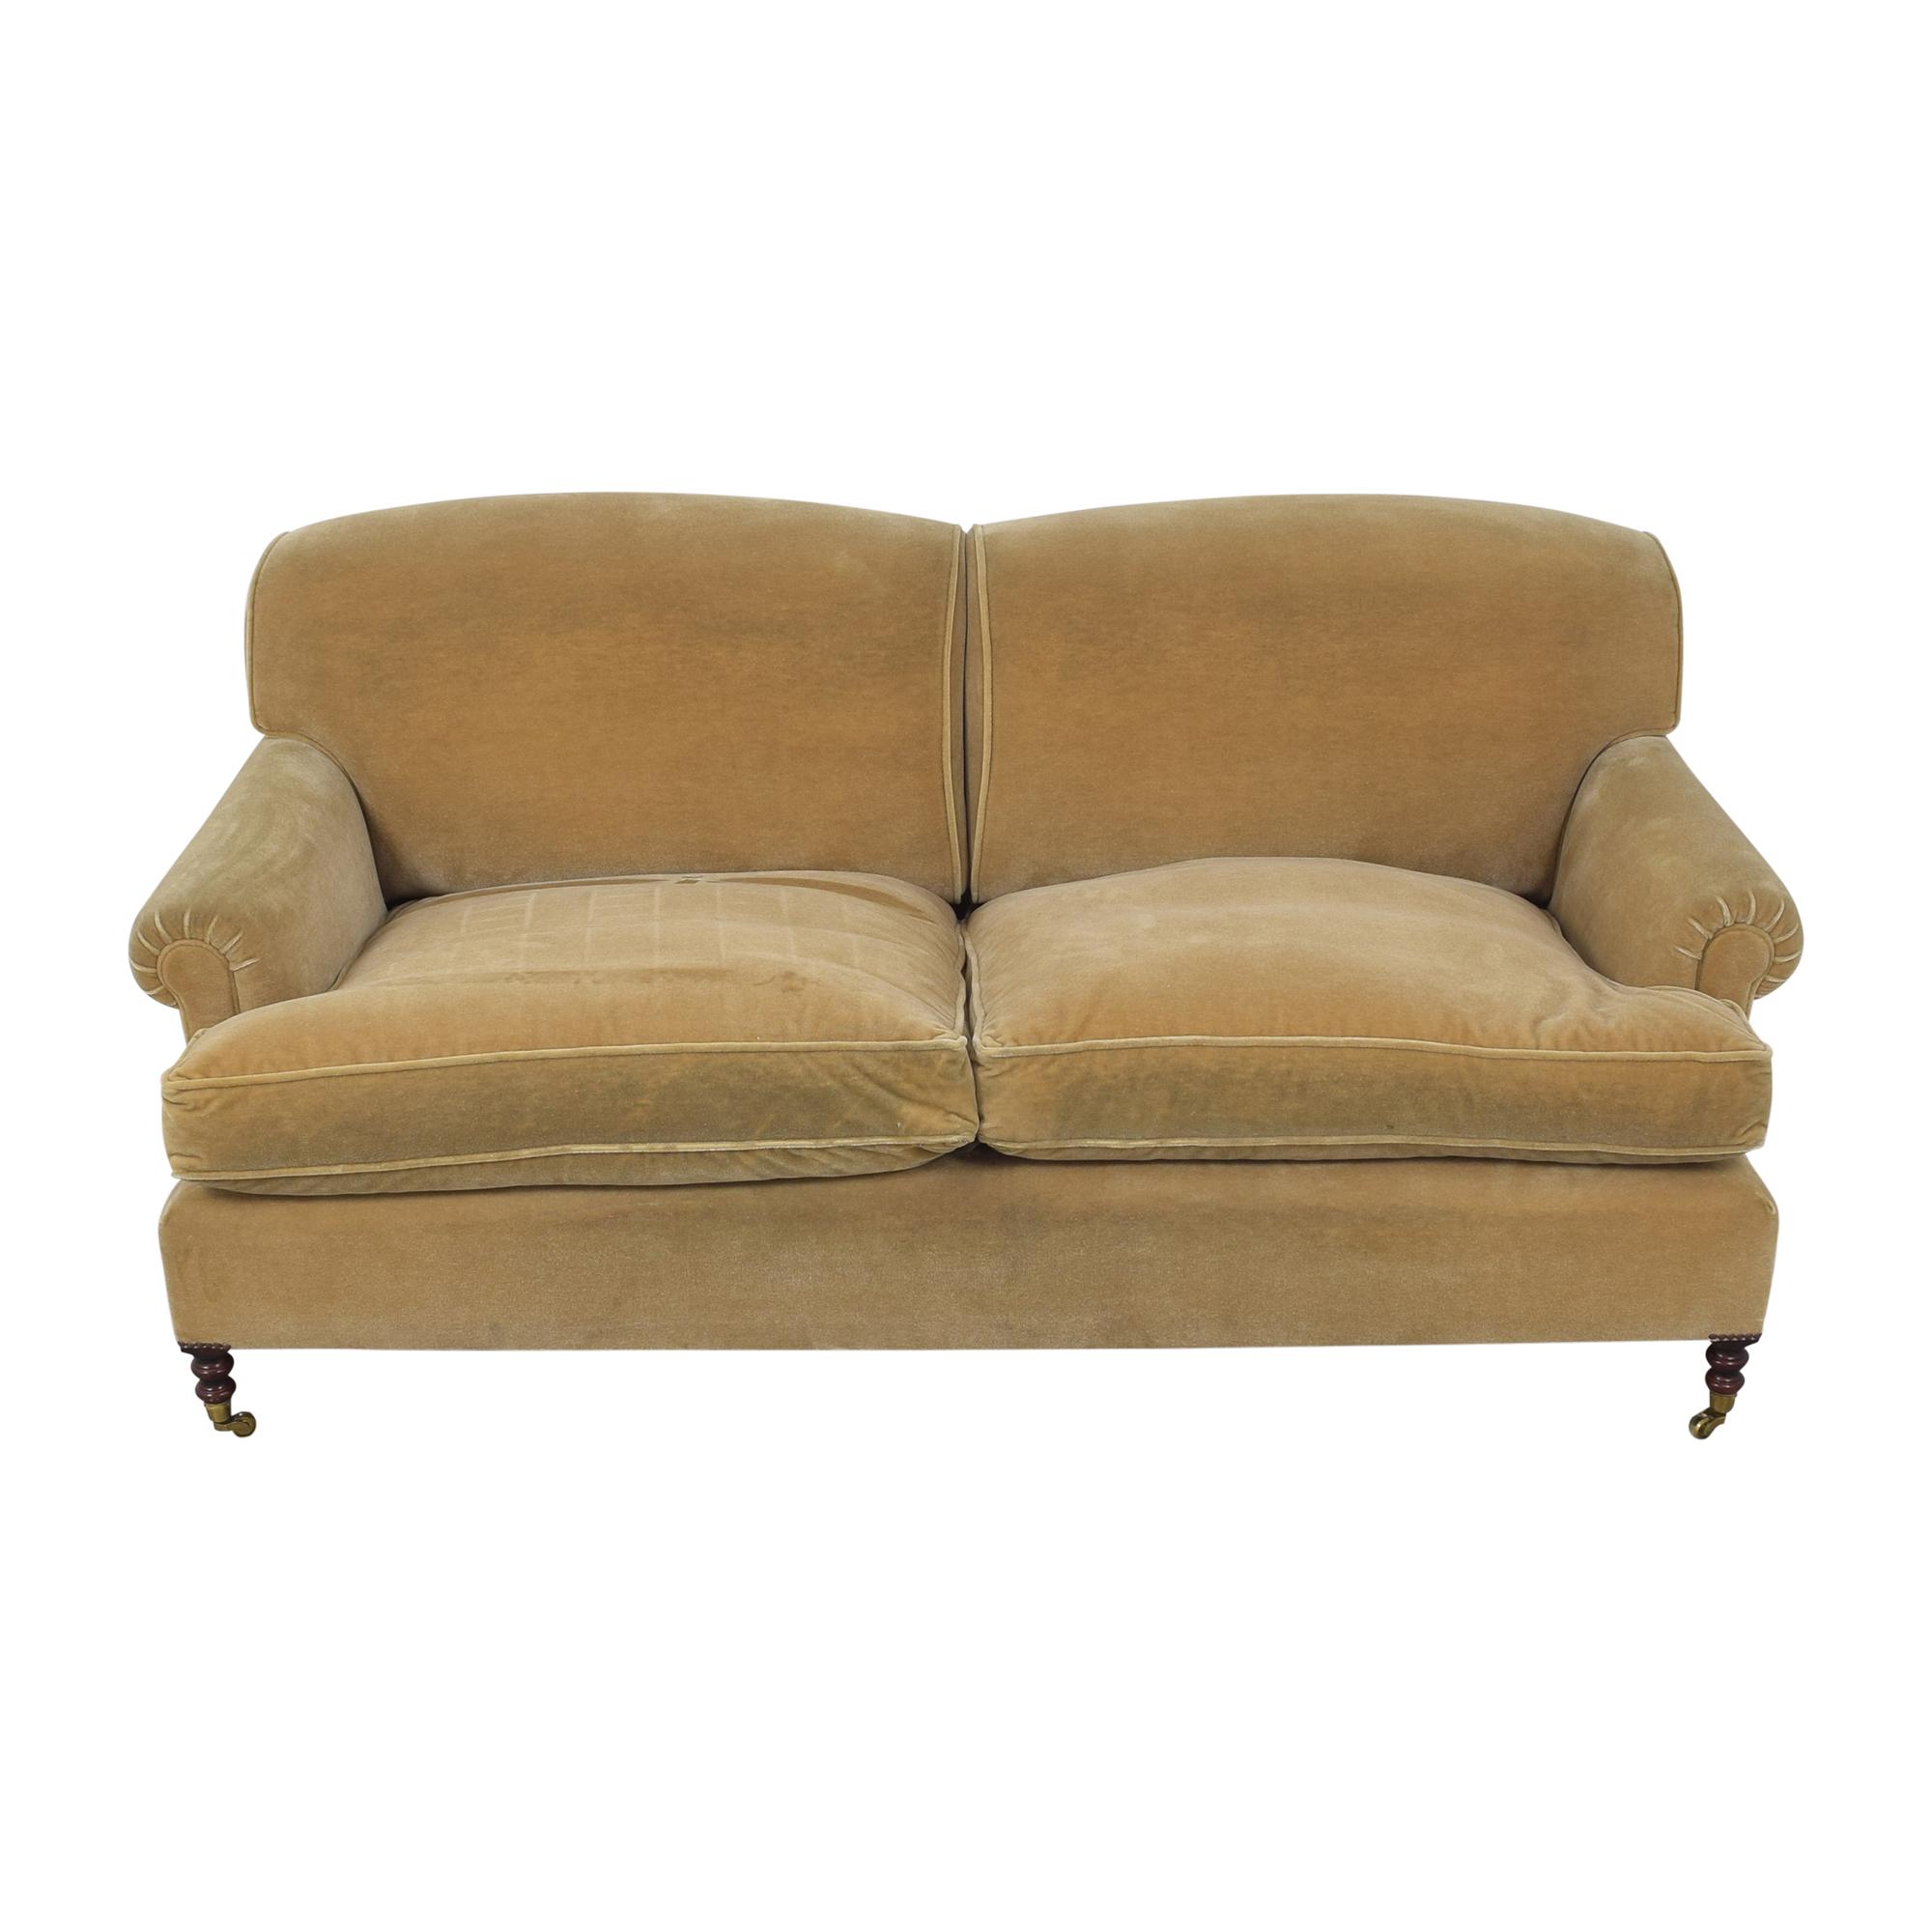 George Smith George Smith Scroll Arm Sofa for sale